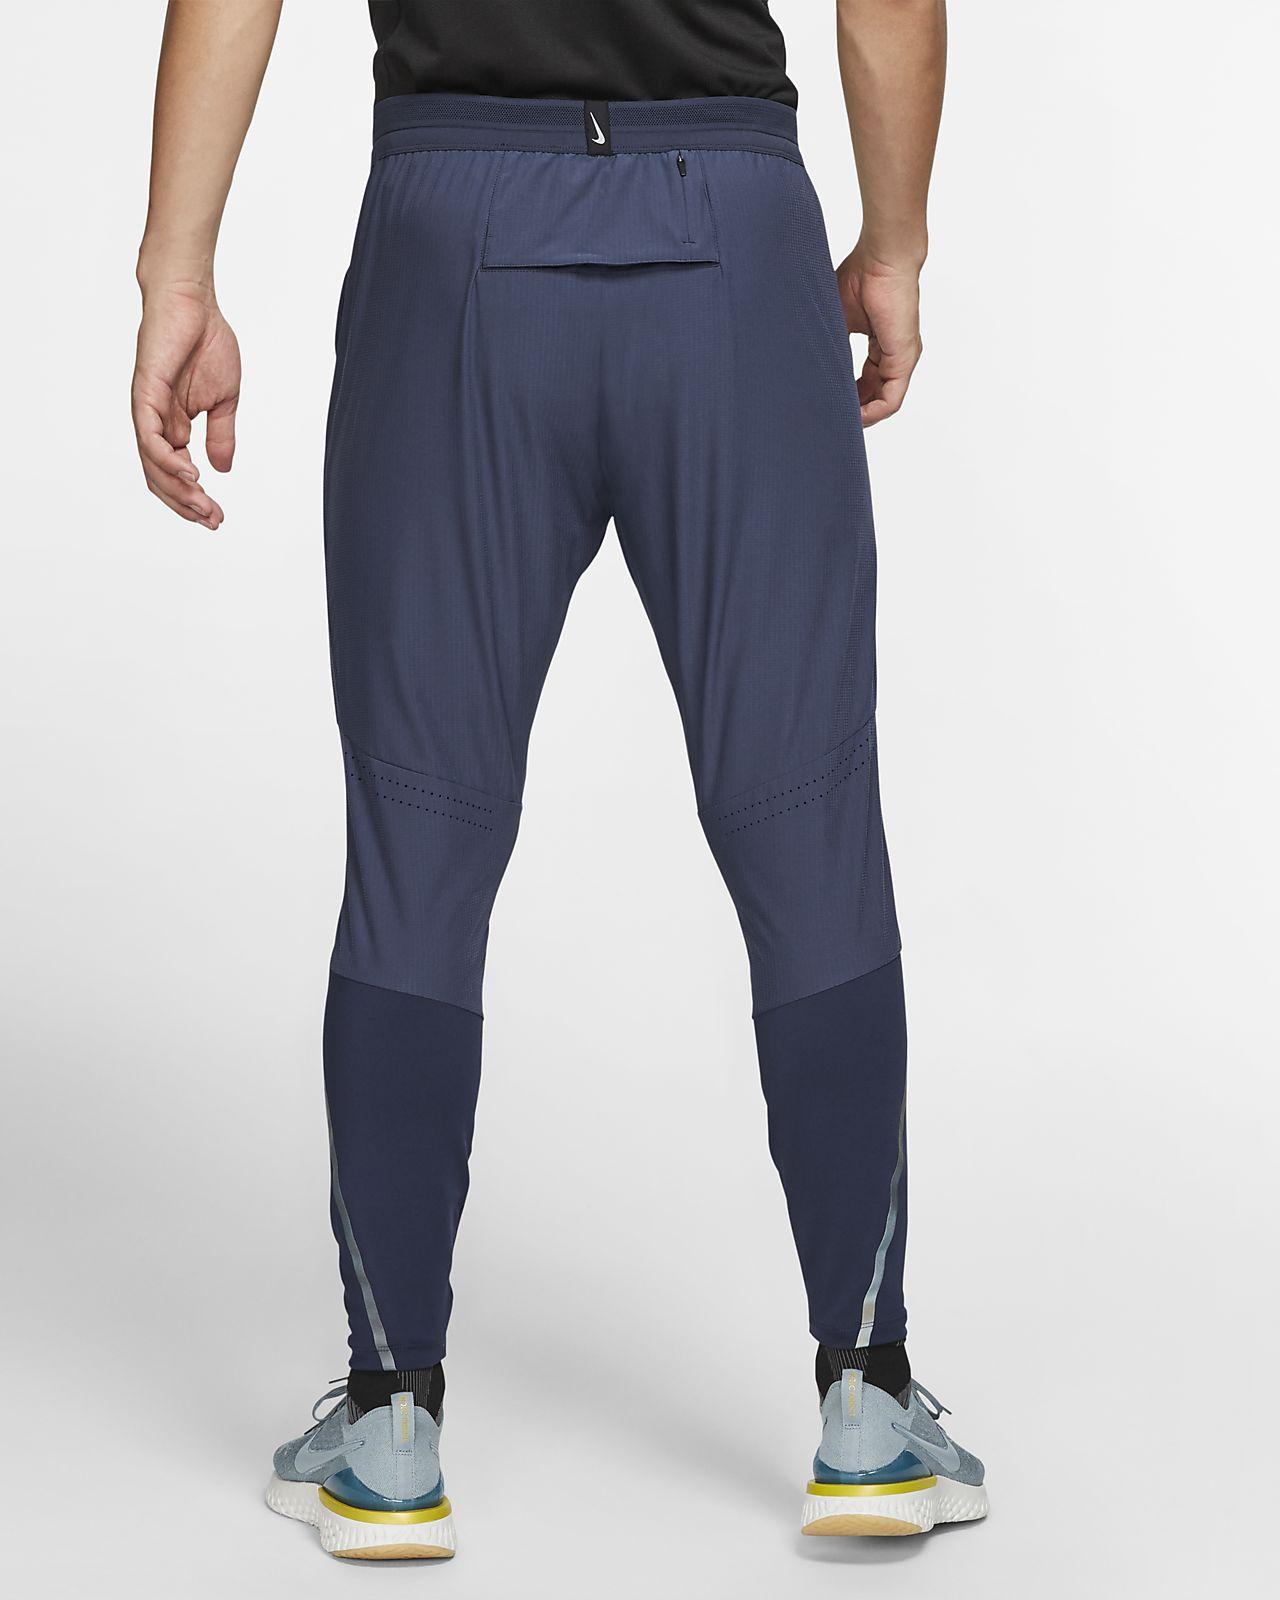 Nike Swift Herren Laufhose